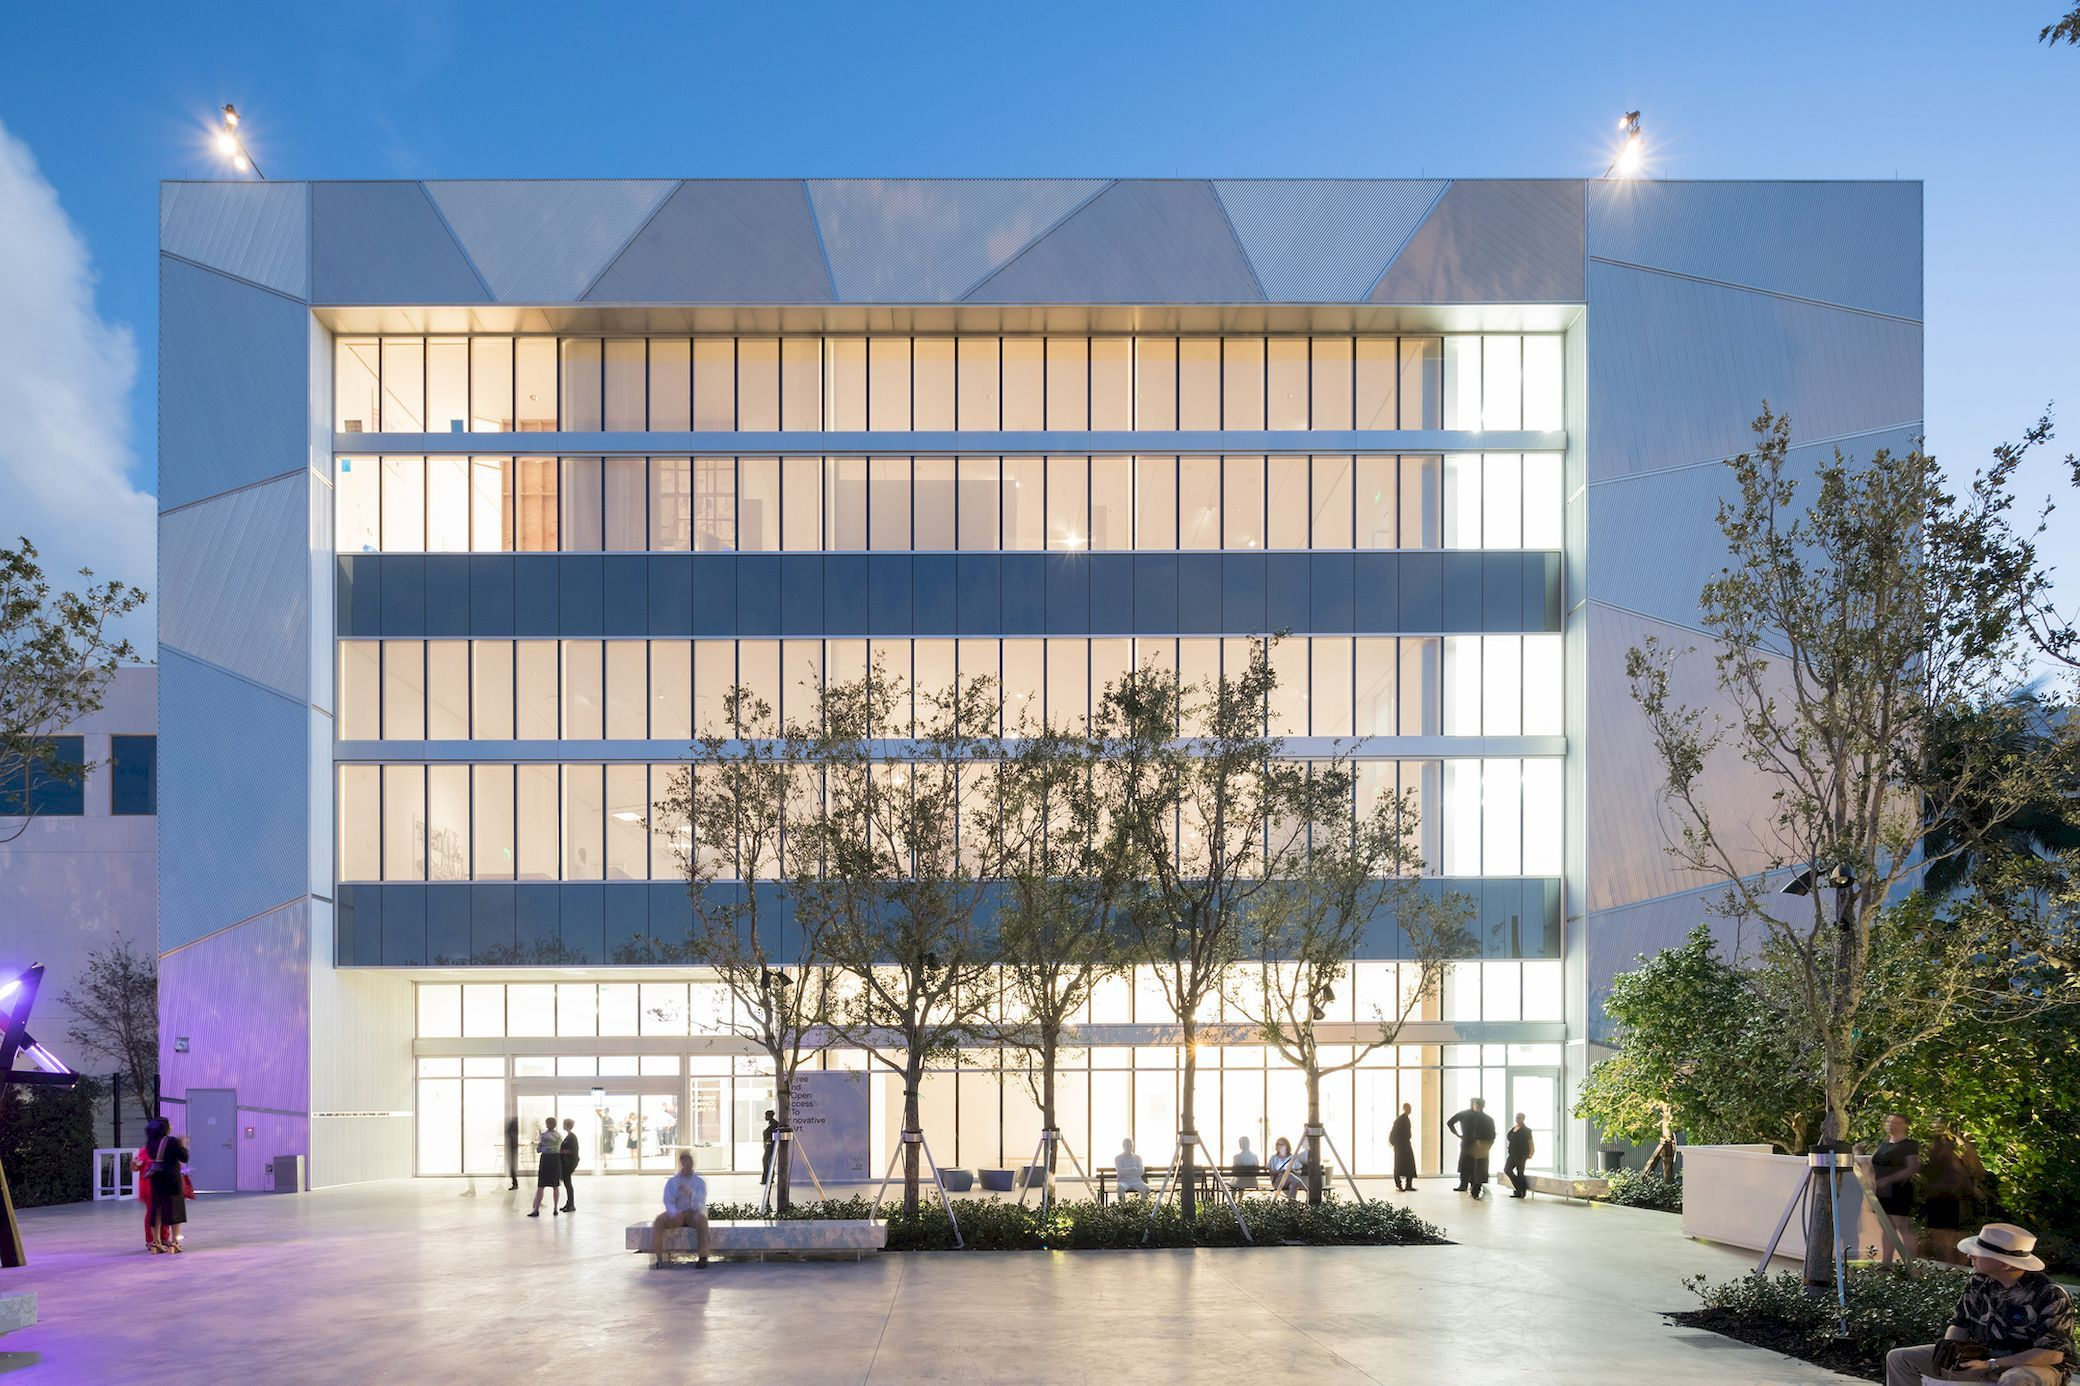 Ica Miami Museum Facade Architecture Architecture Details Building